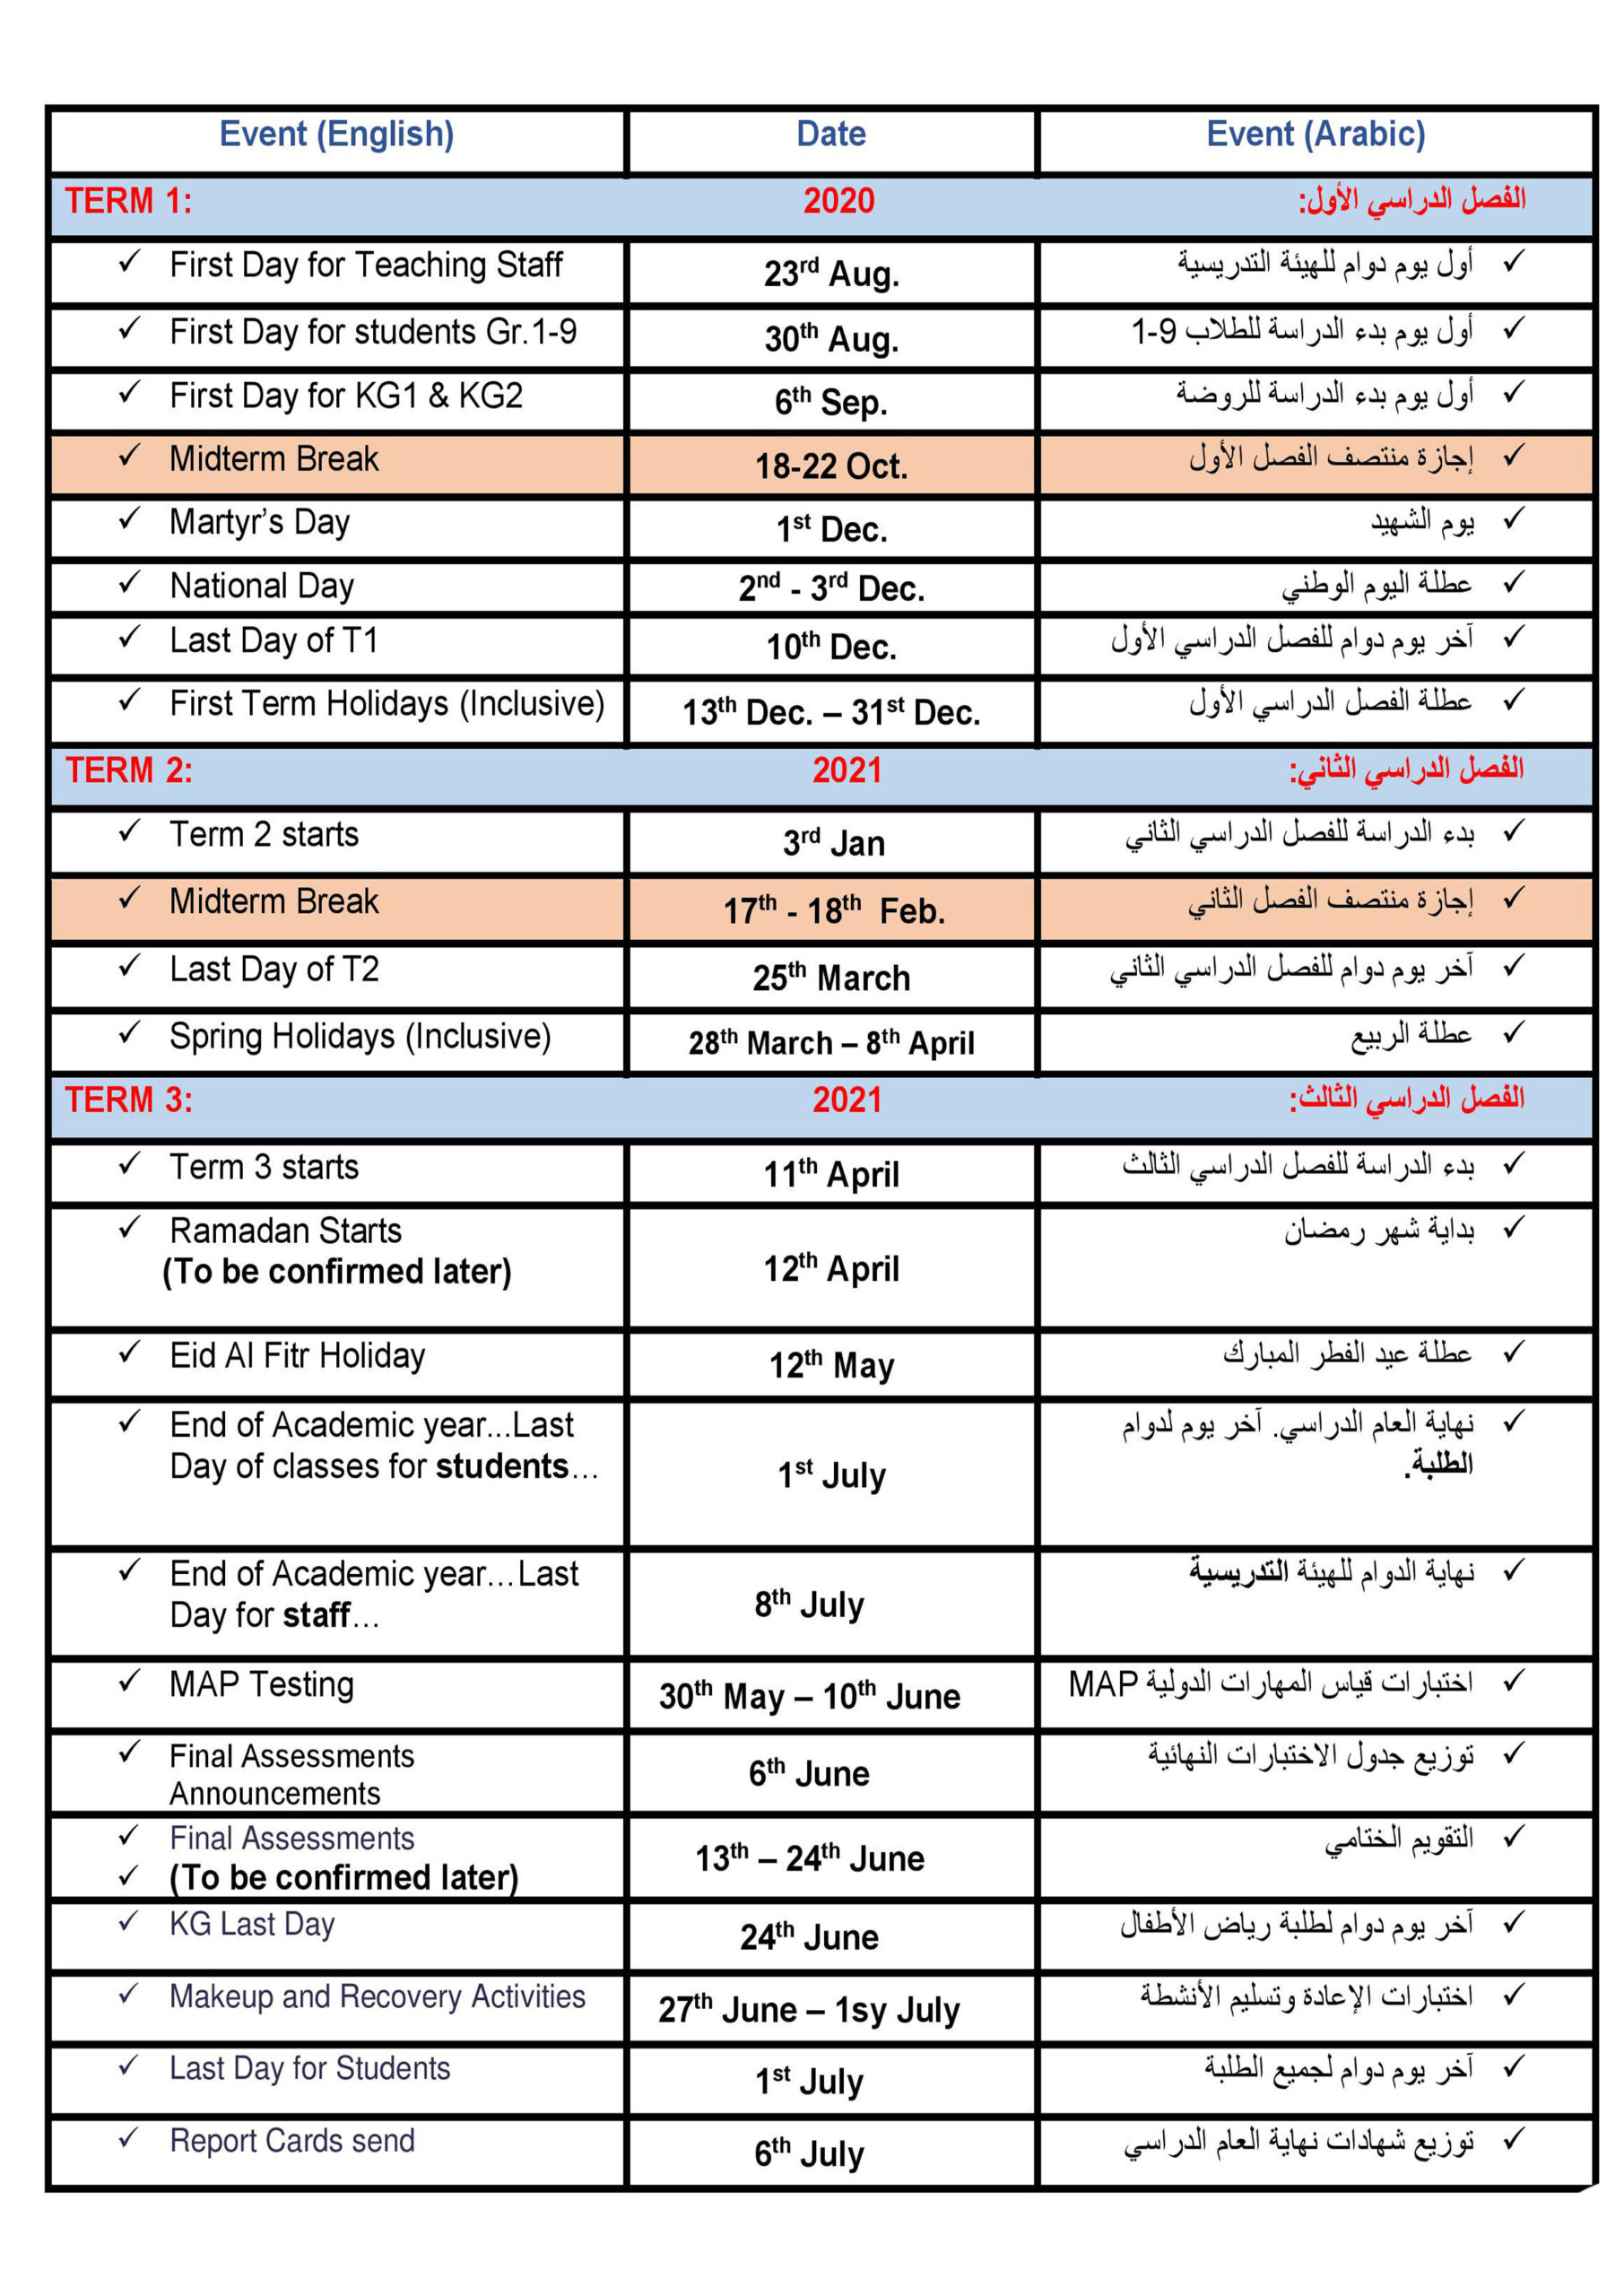 Calendar of Events 2020-2021.jpg